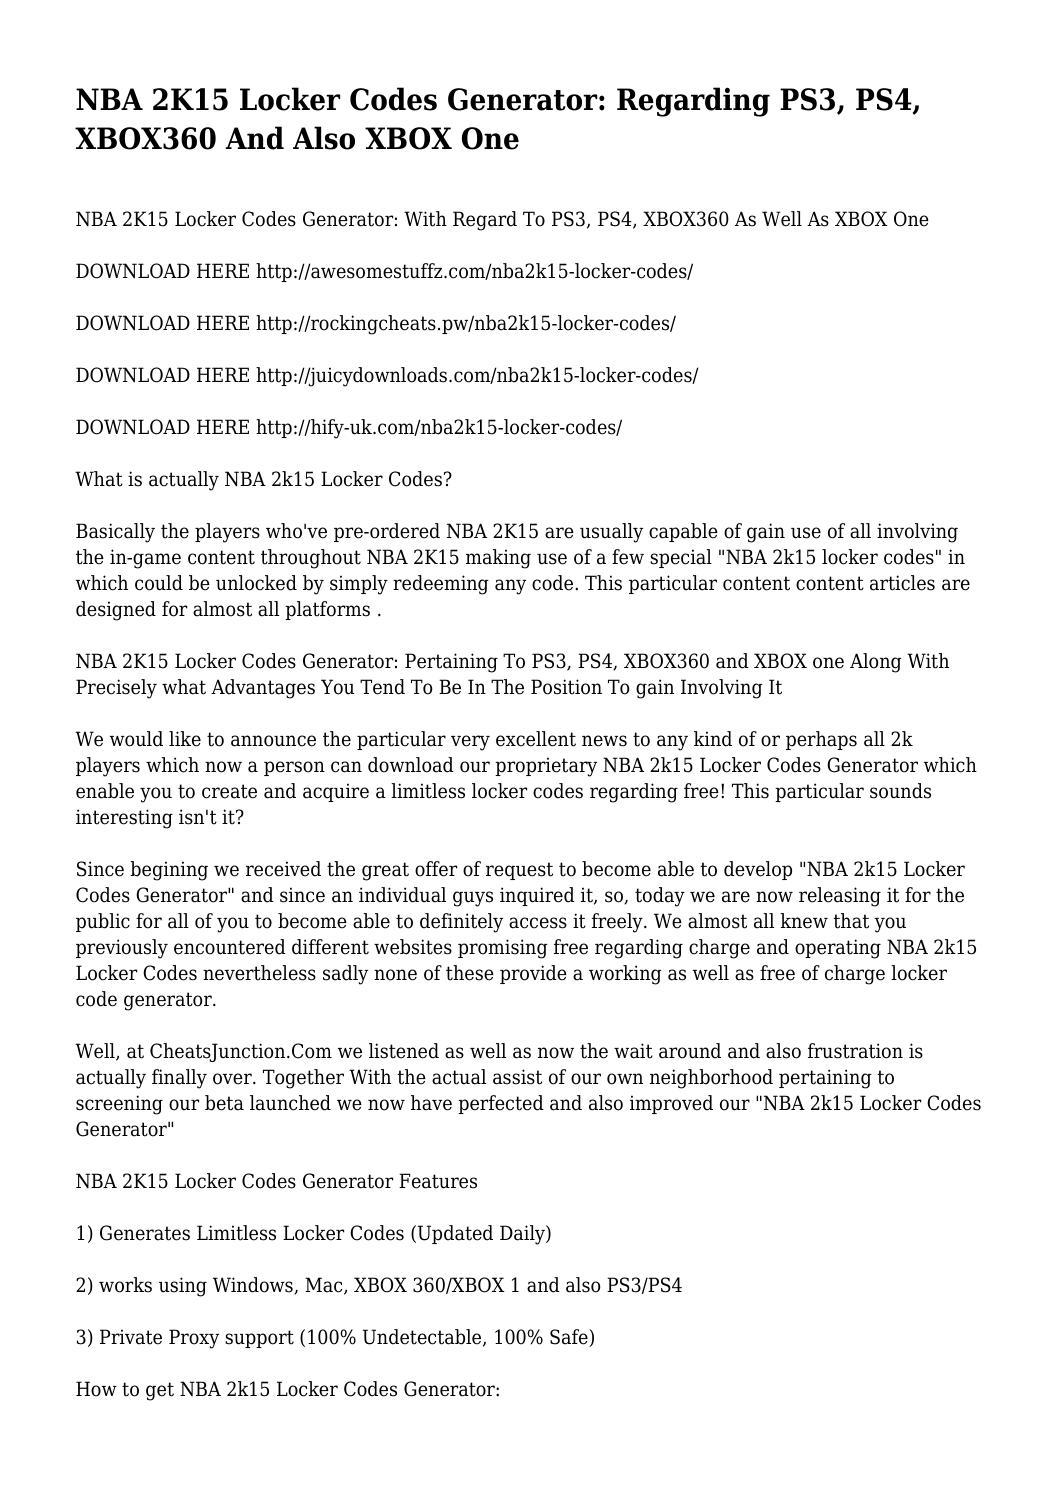 NBA 2K15 Locker Codes Generator: Regarding PS3, PS4, XBOX360